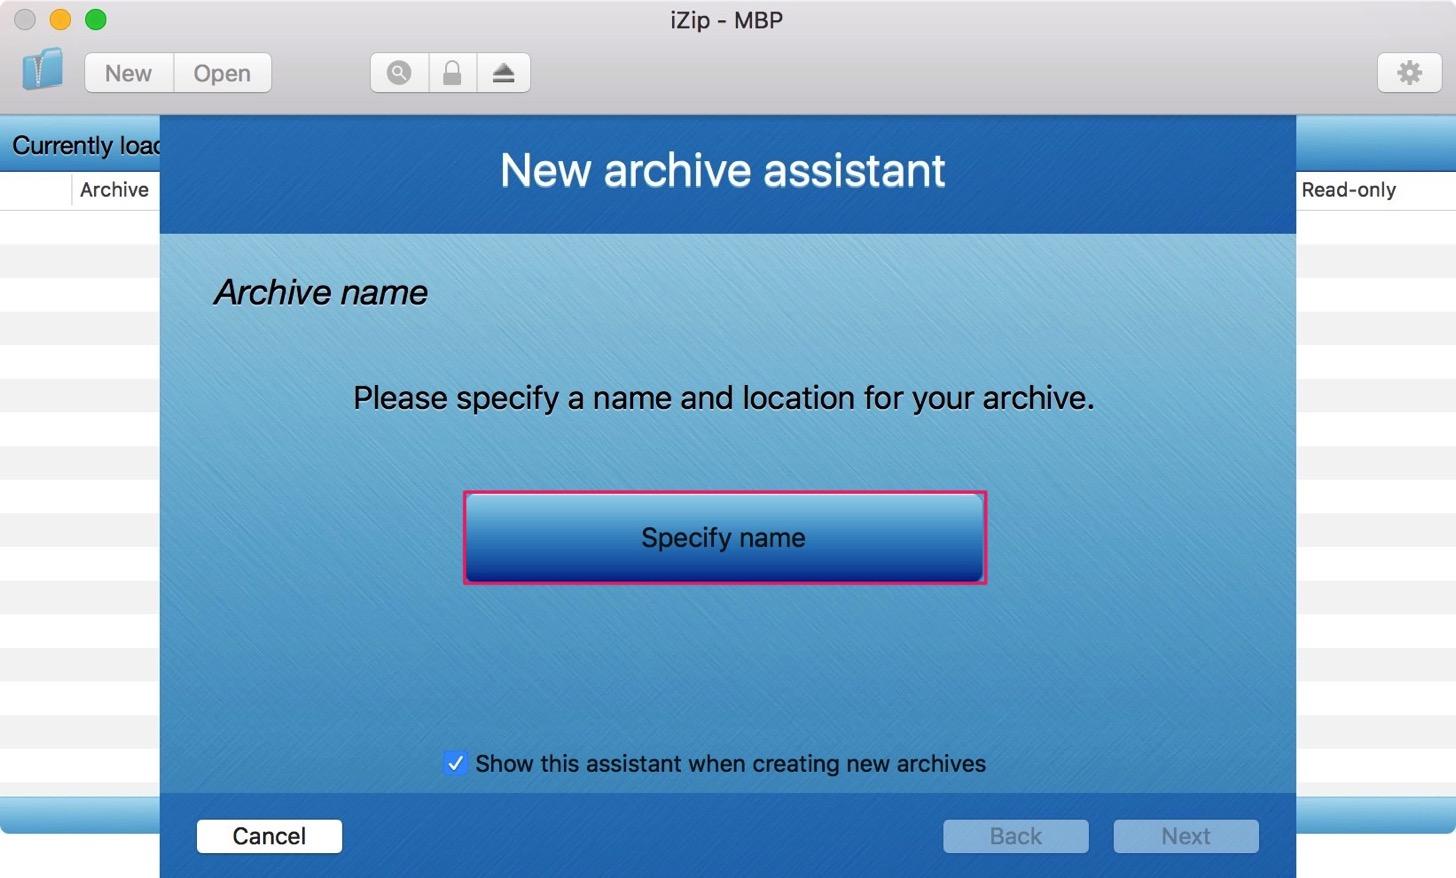 Specify nameボタンをクリック。